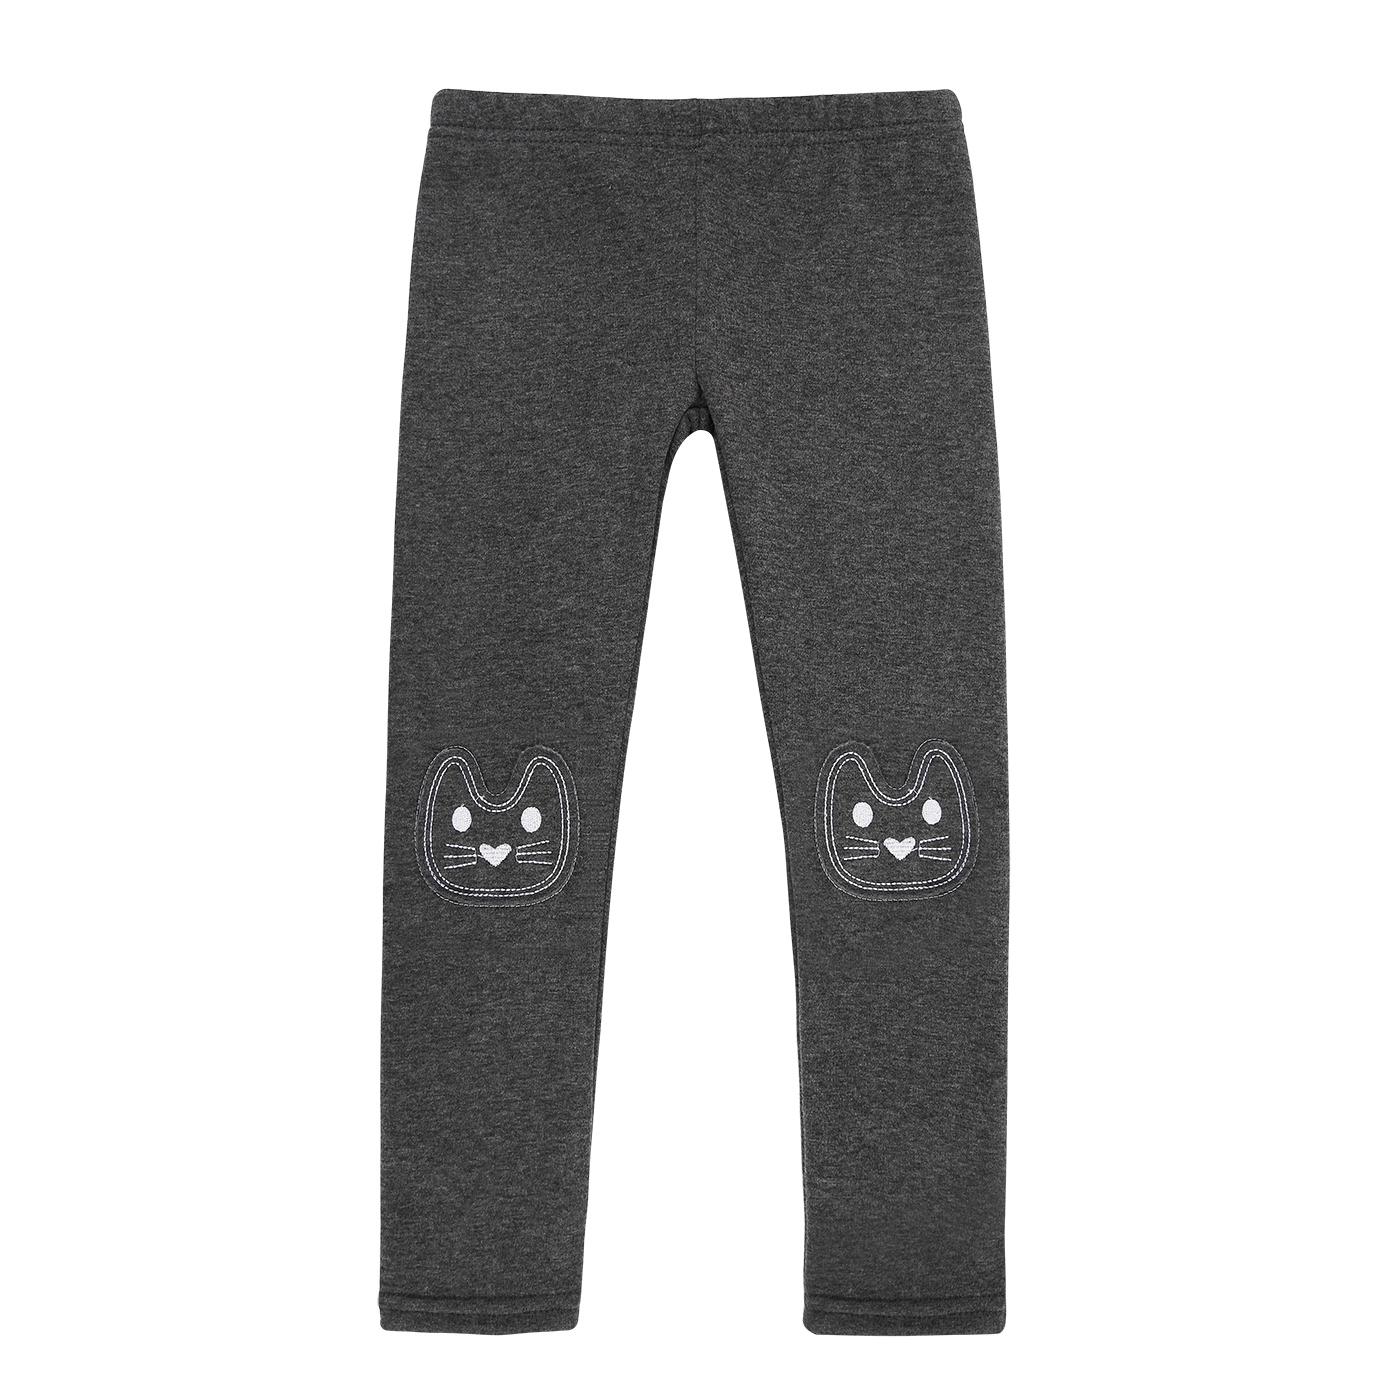 398e318fccb13 HDE Girls Fleece Winter Knit Leggings Kids Nordic Stretch Pants Footless  Tights (Black White Checkered, Medium / 7-8 )